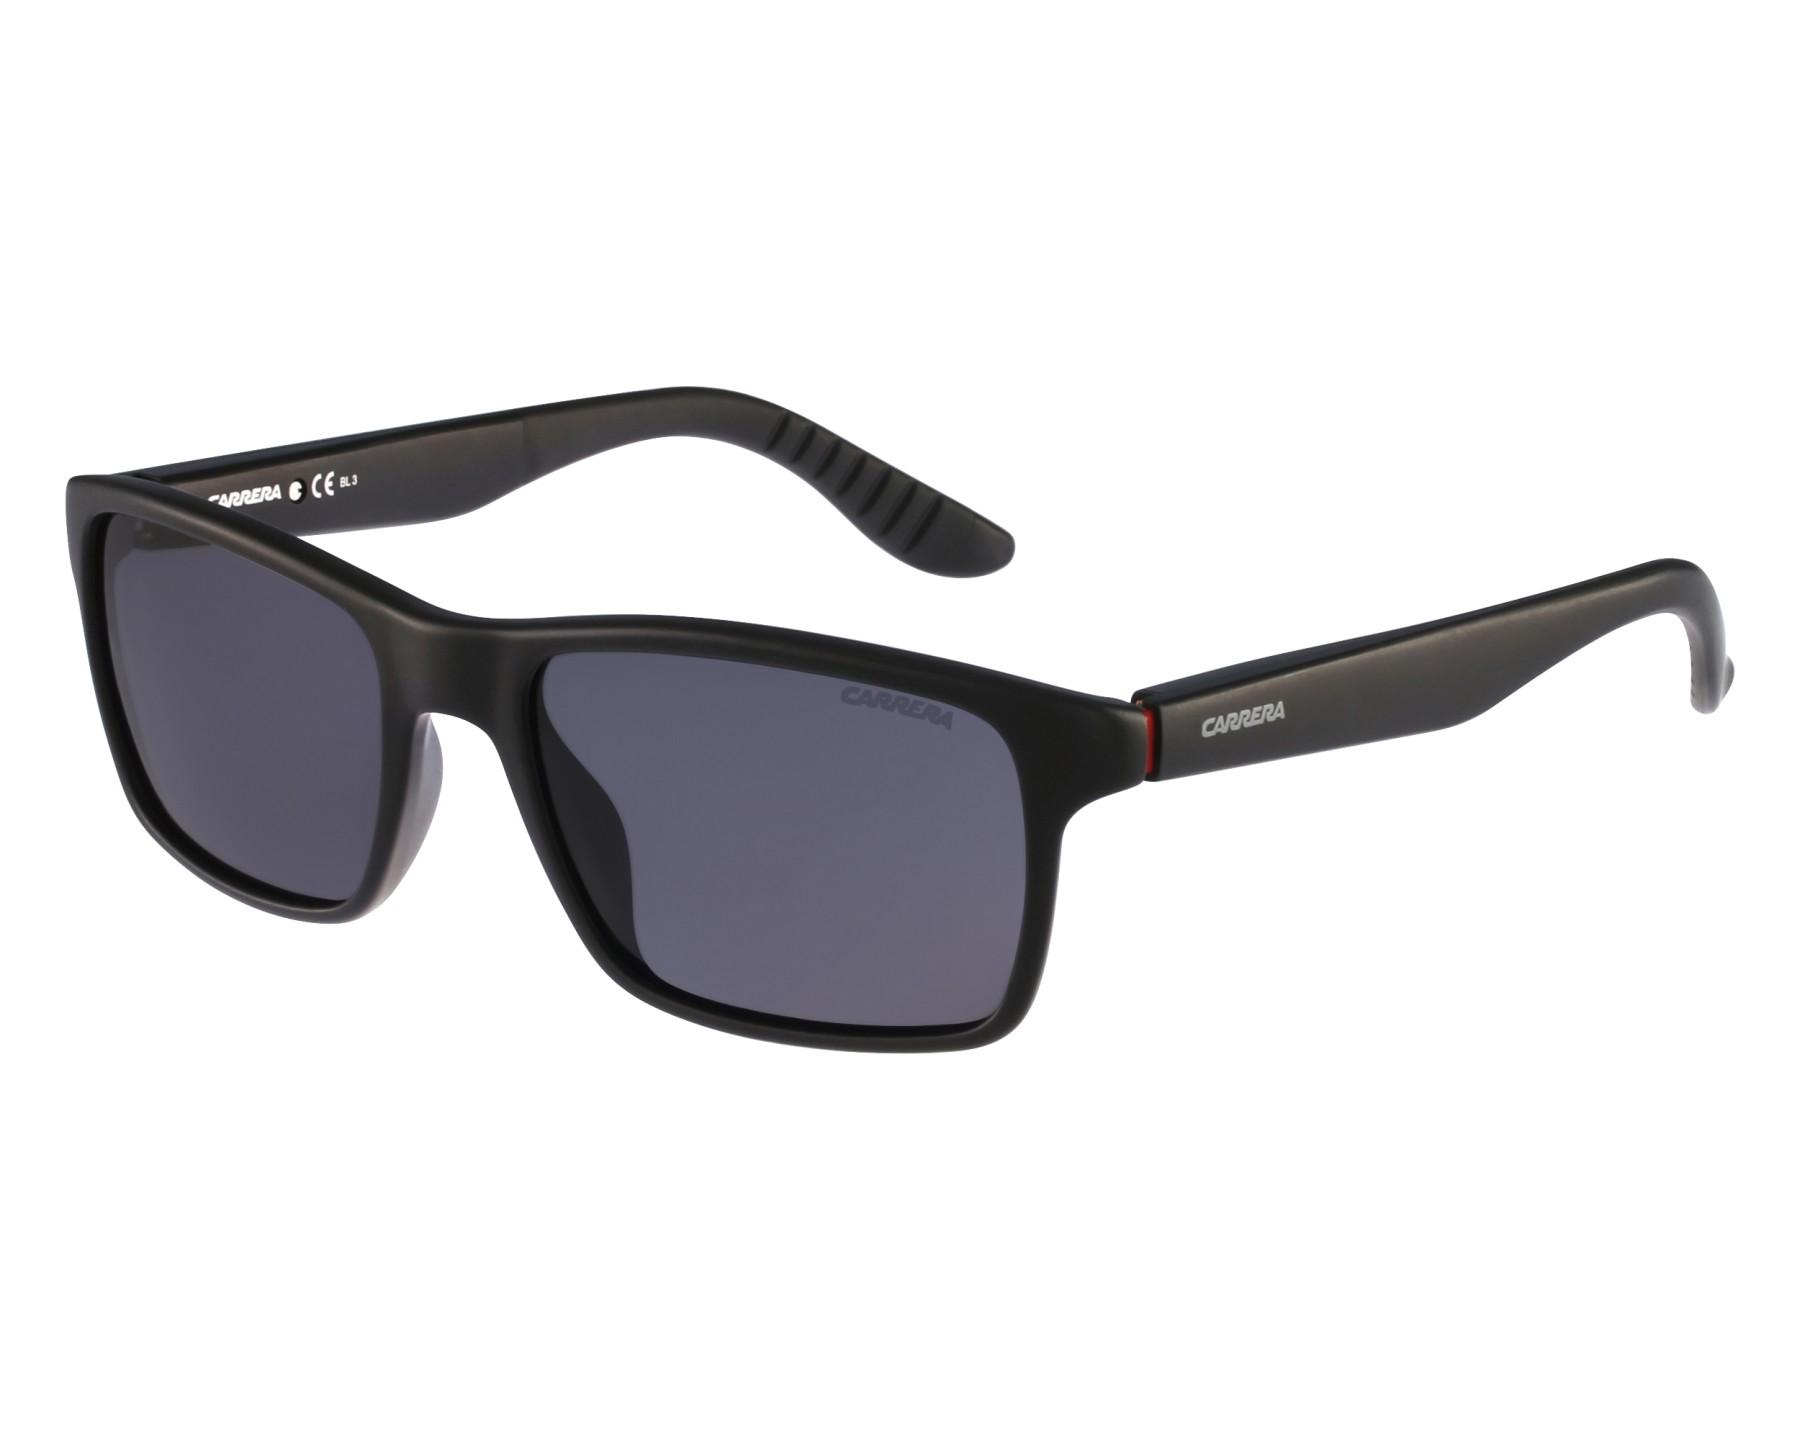 3787528a19962 Sunglasses Carrera 8002 DL5 TD - Black front view